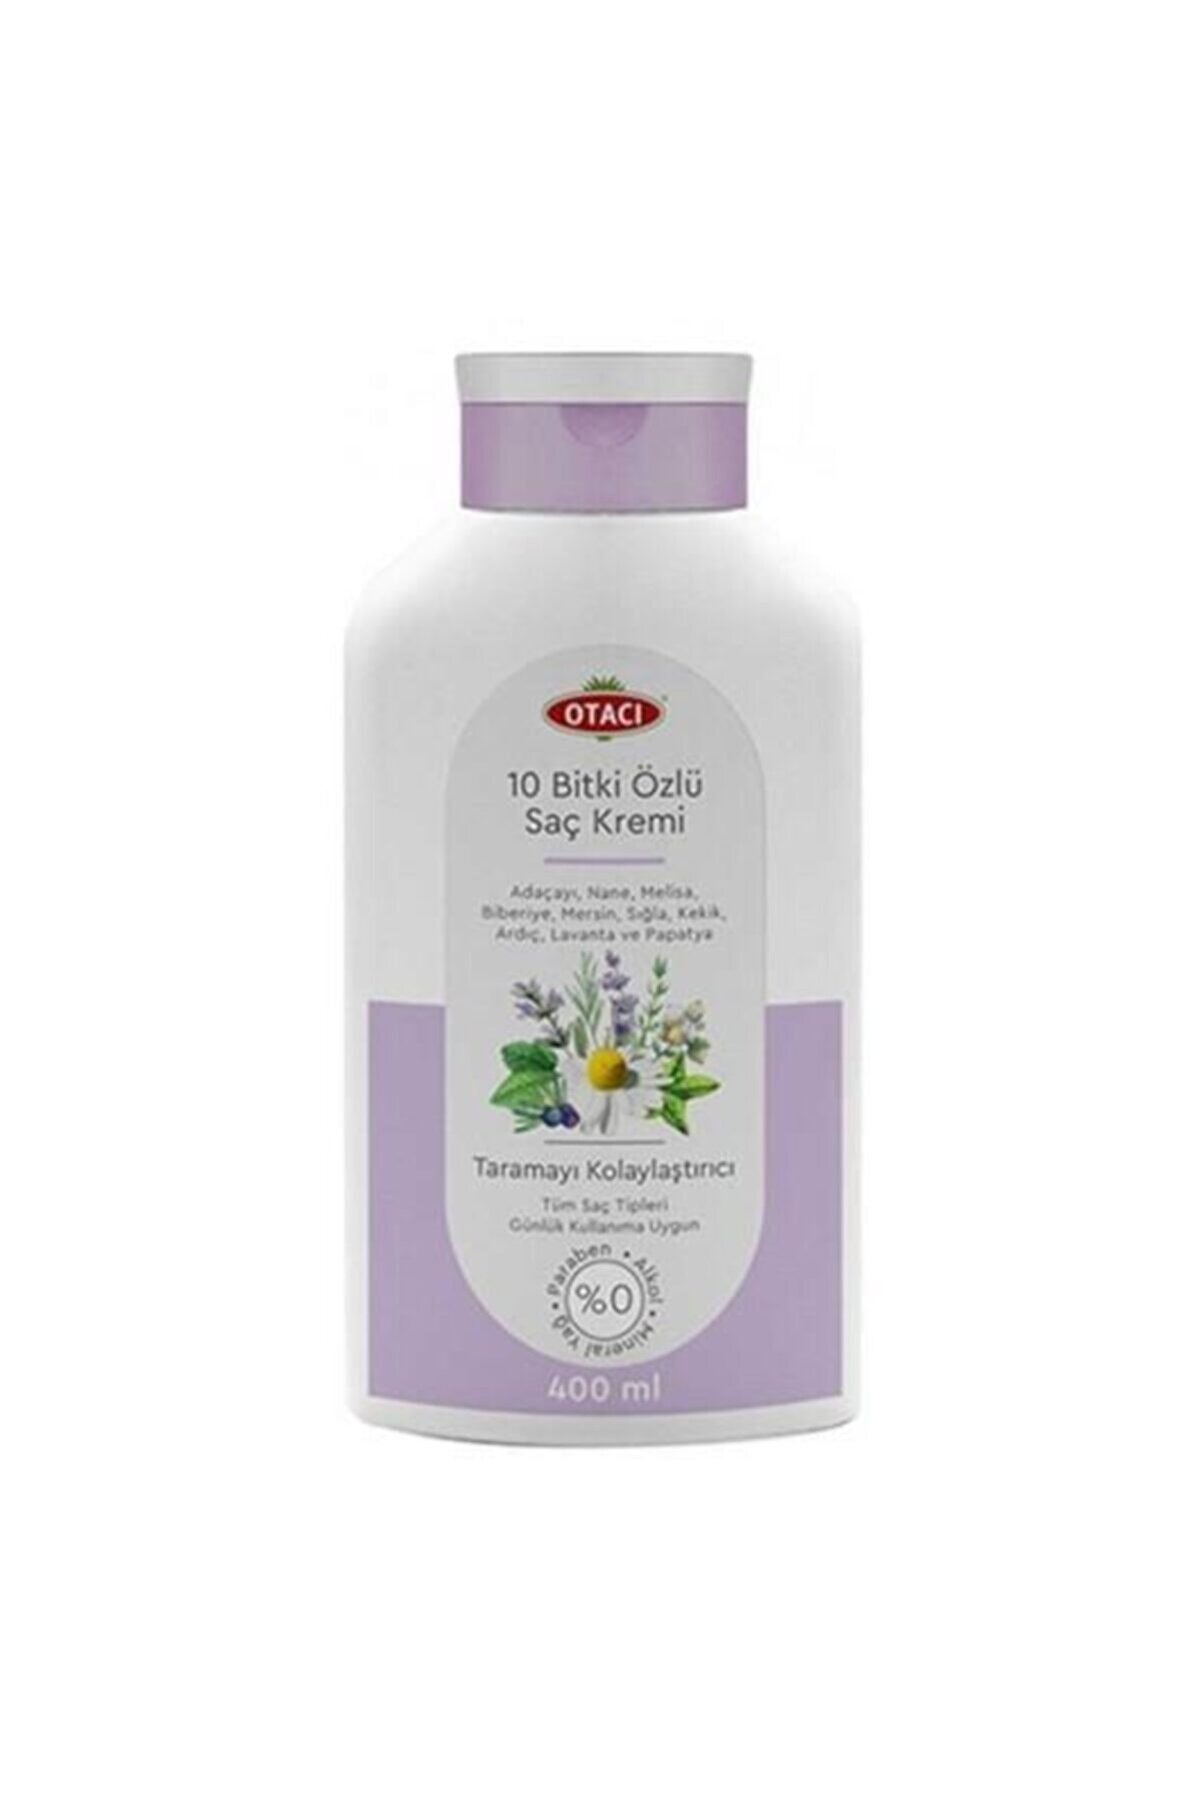 Otacı Saç Kremi 400 ml 10 Bitki